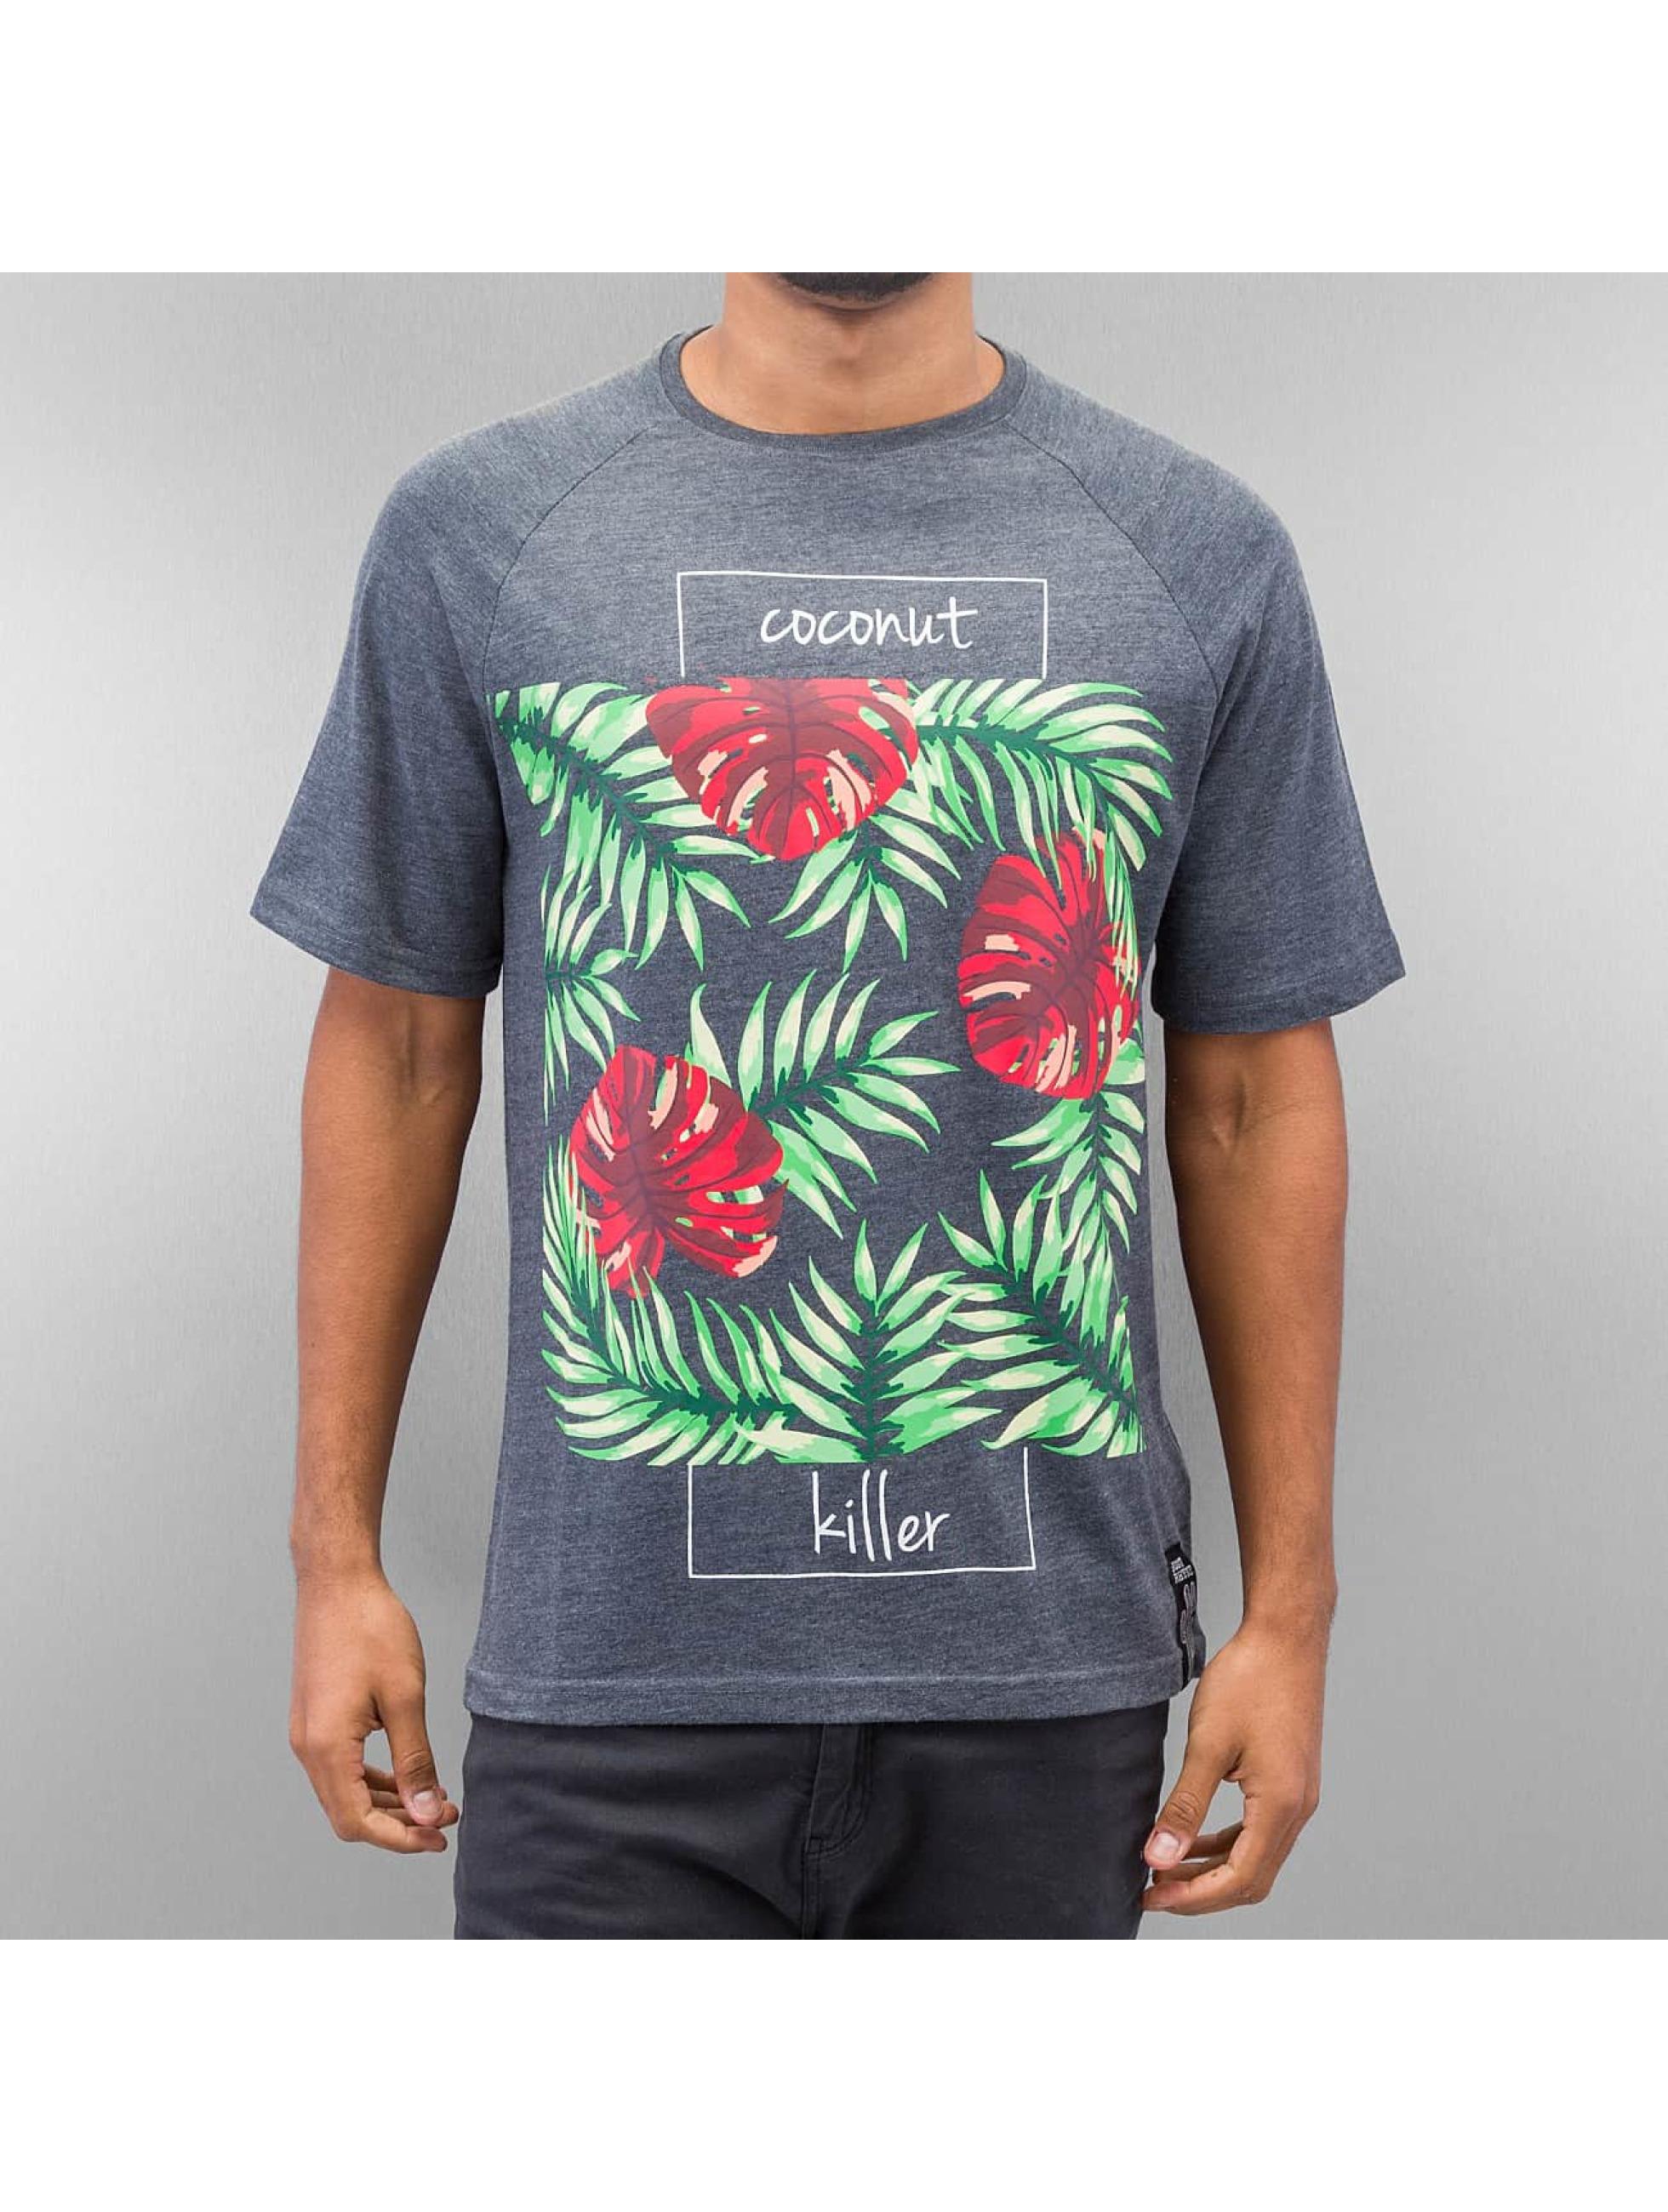 Just Rhyse T-Shirt Coconut Killer schwarz